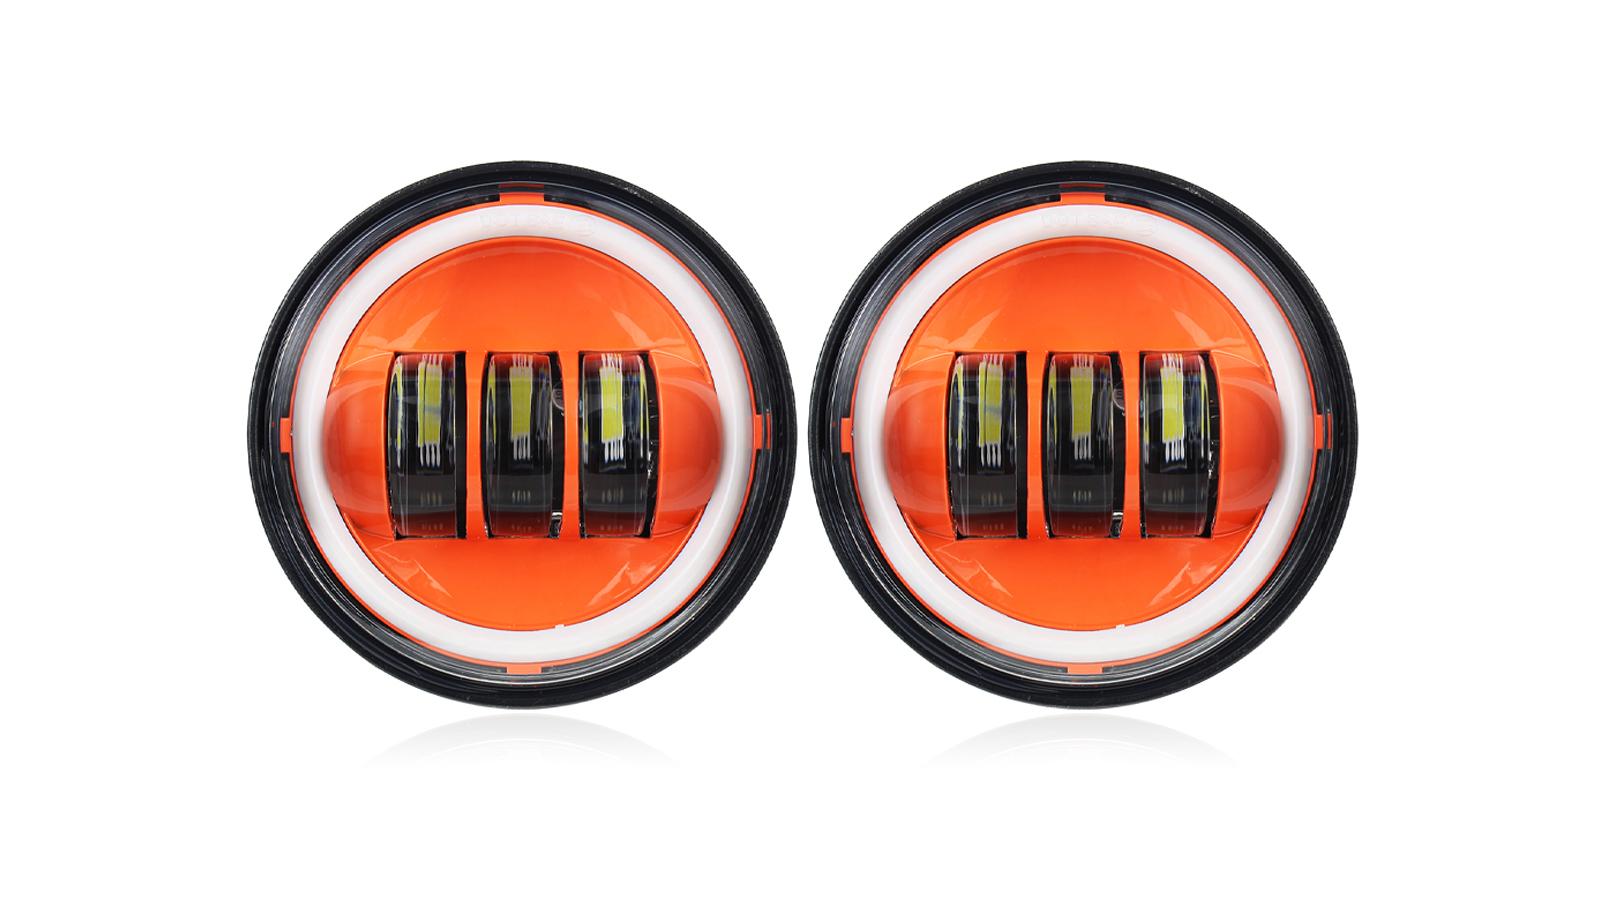 "Orange Halo 4-1 / 2 ""4.5 بوصة أدى ضوء يمر ل هارلي ديفيدسون الضباب مساعد ضوء لمبة العارض بقعة مصباح القيادة"